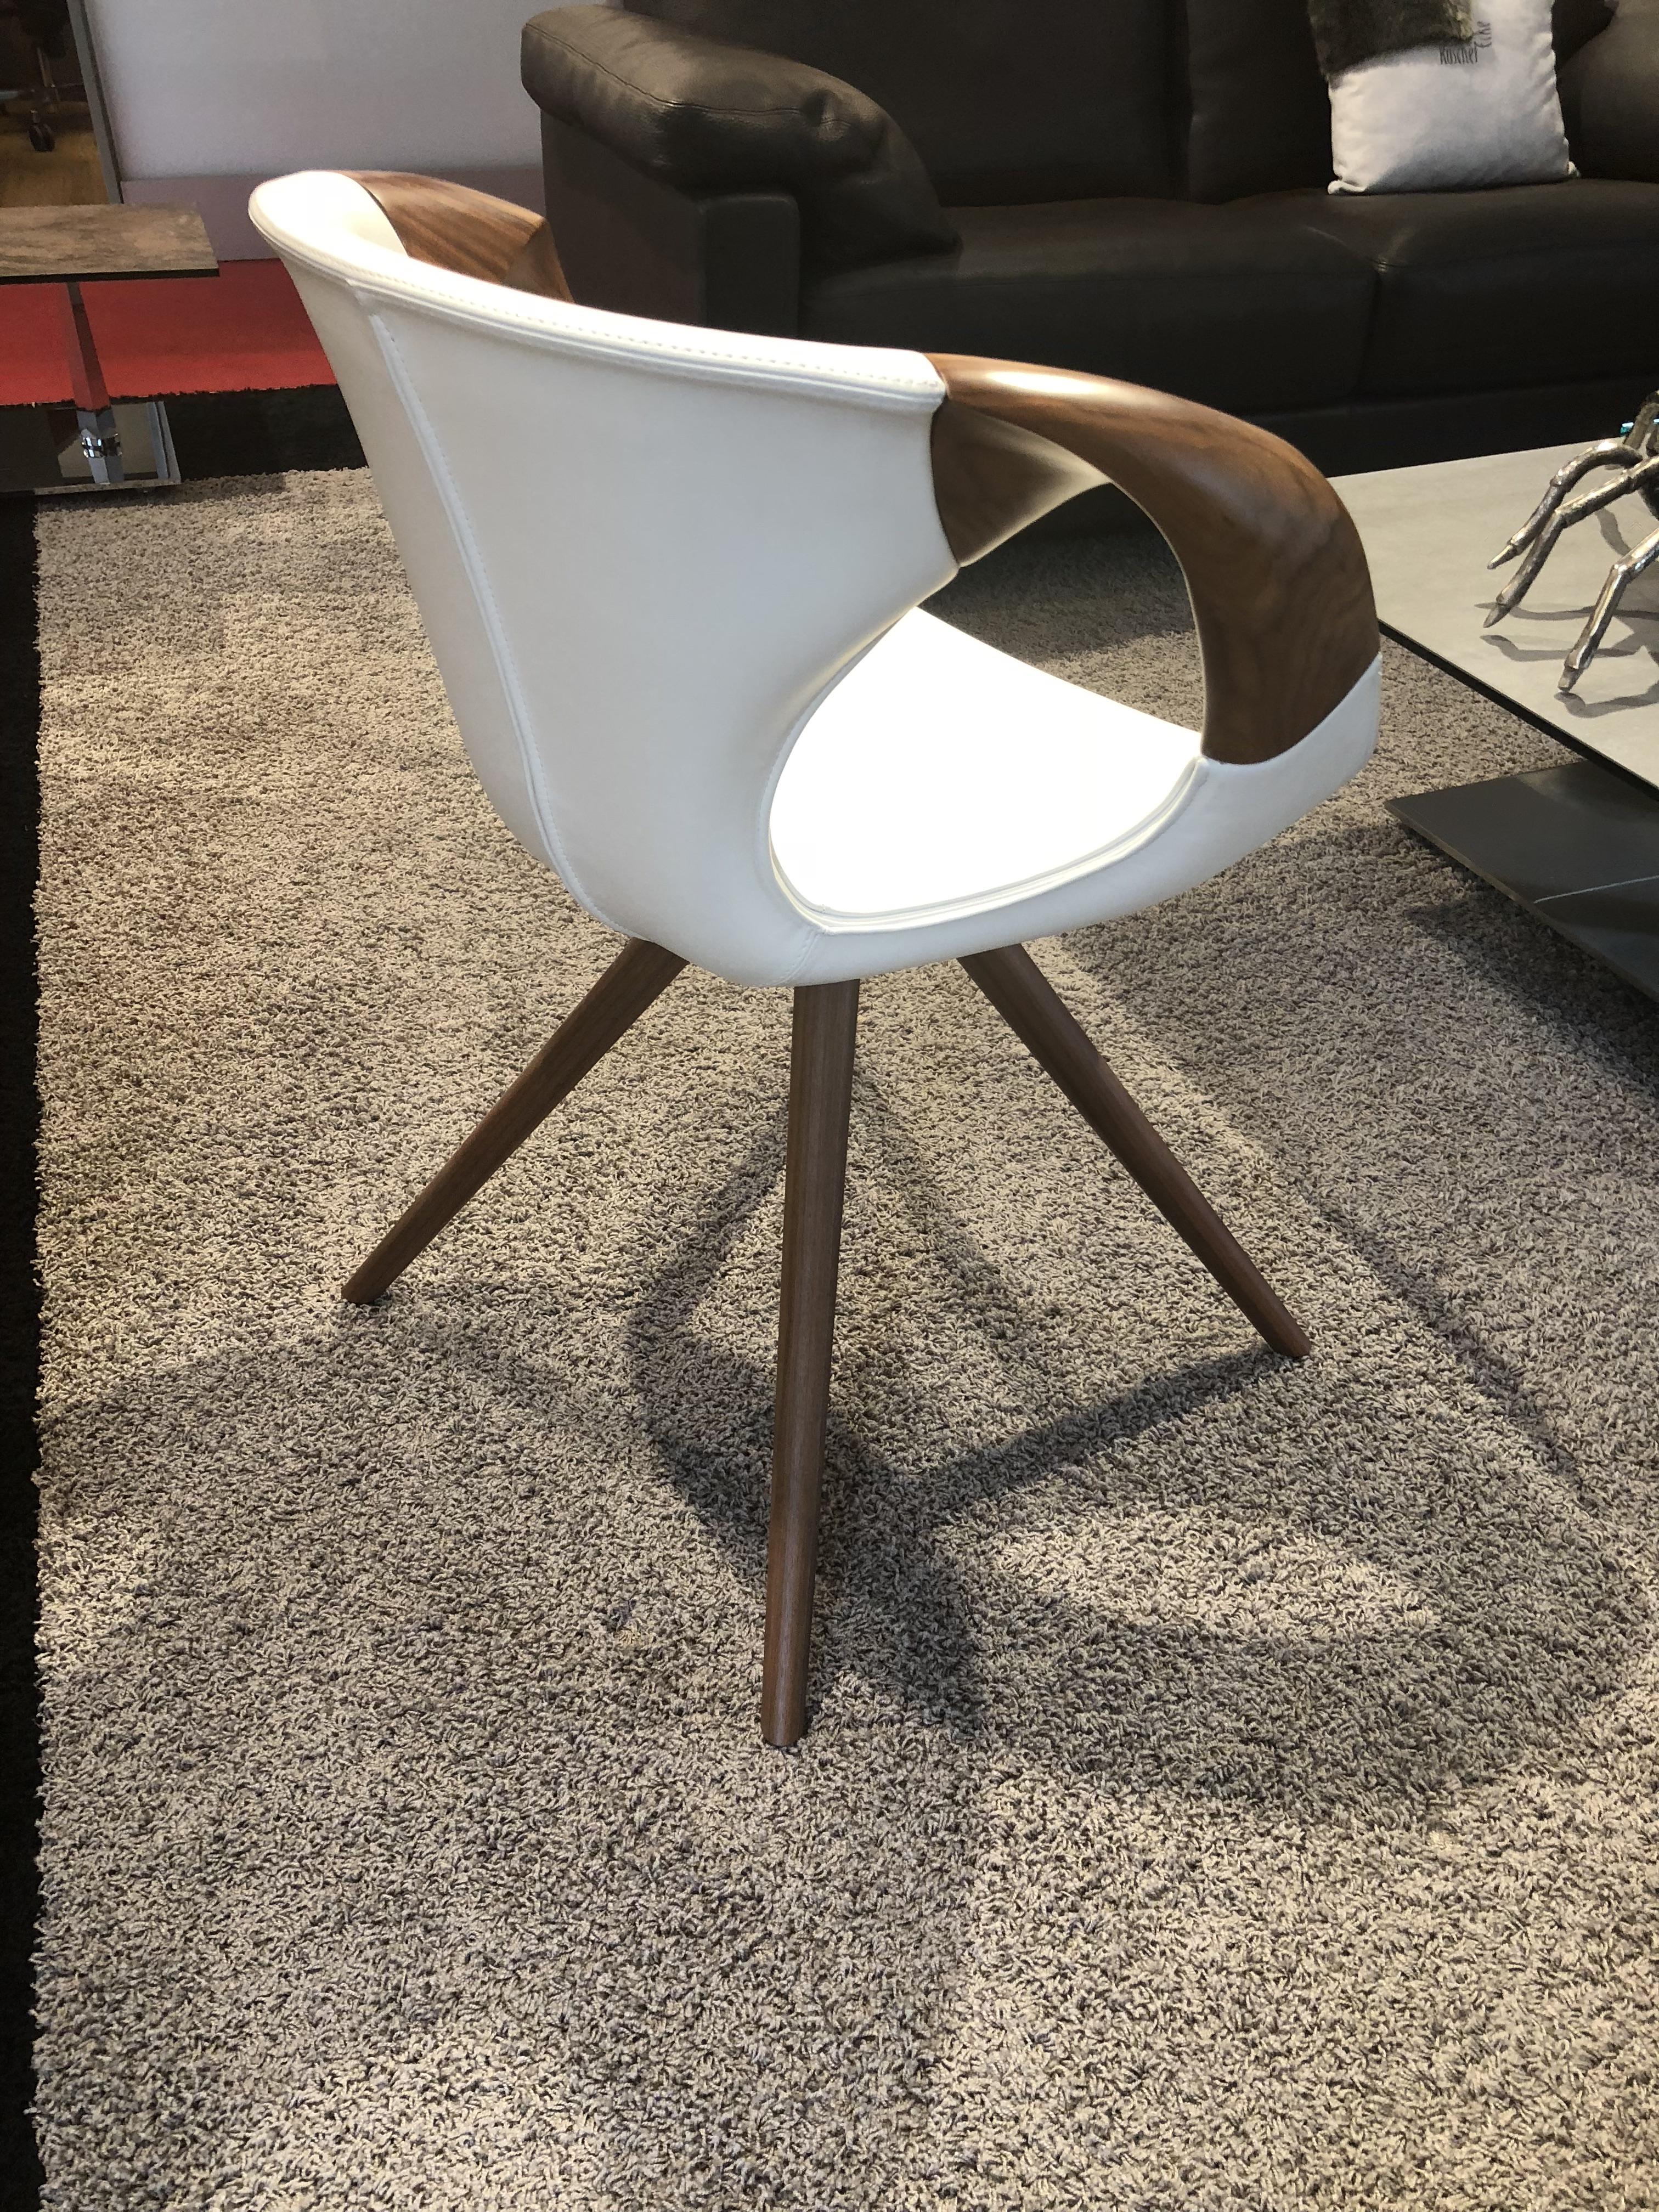 mein ausstellungsst ck aera stuhlsessel toledo 1 917 15 8. Black Bedroom Furniture Sets. Home Design Ideas